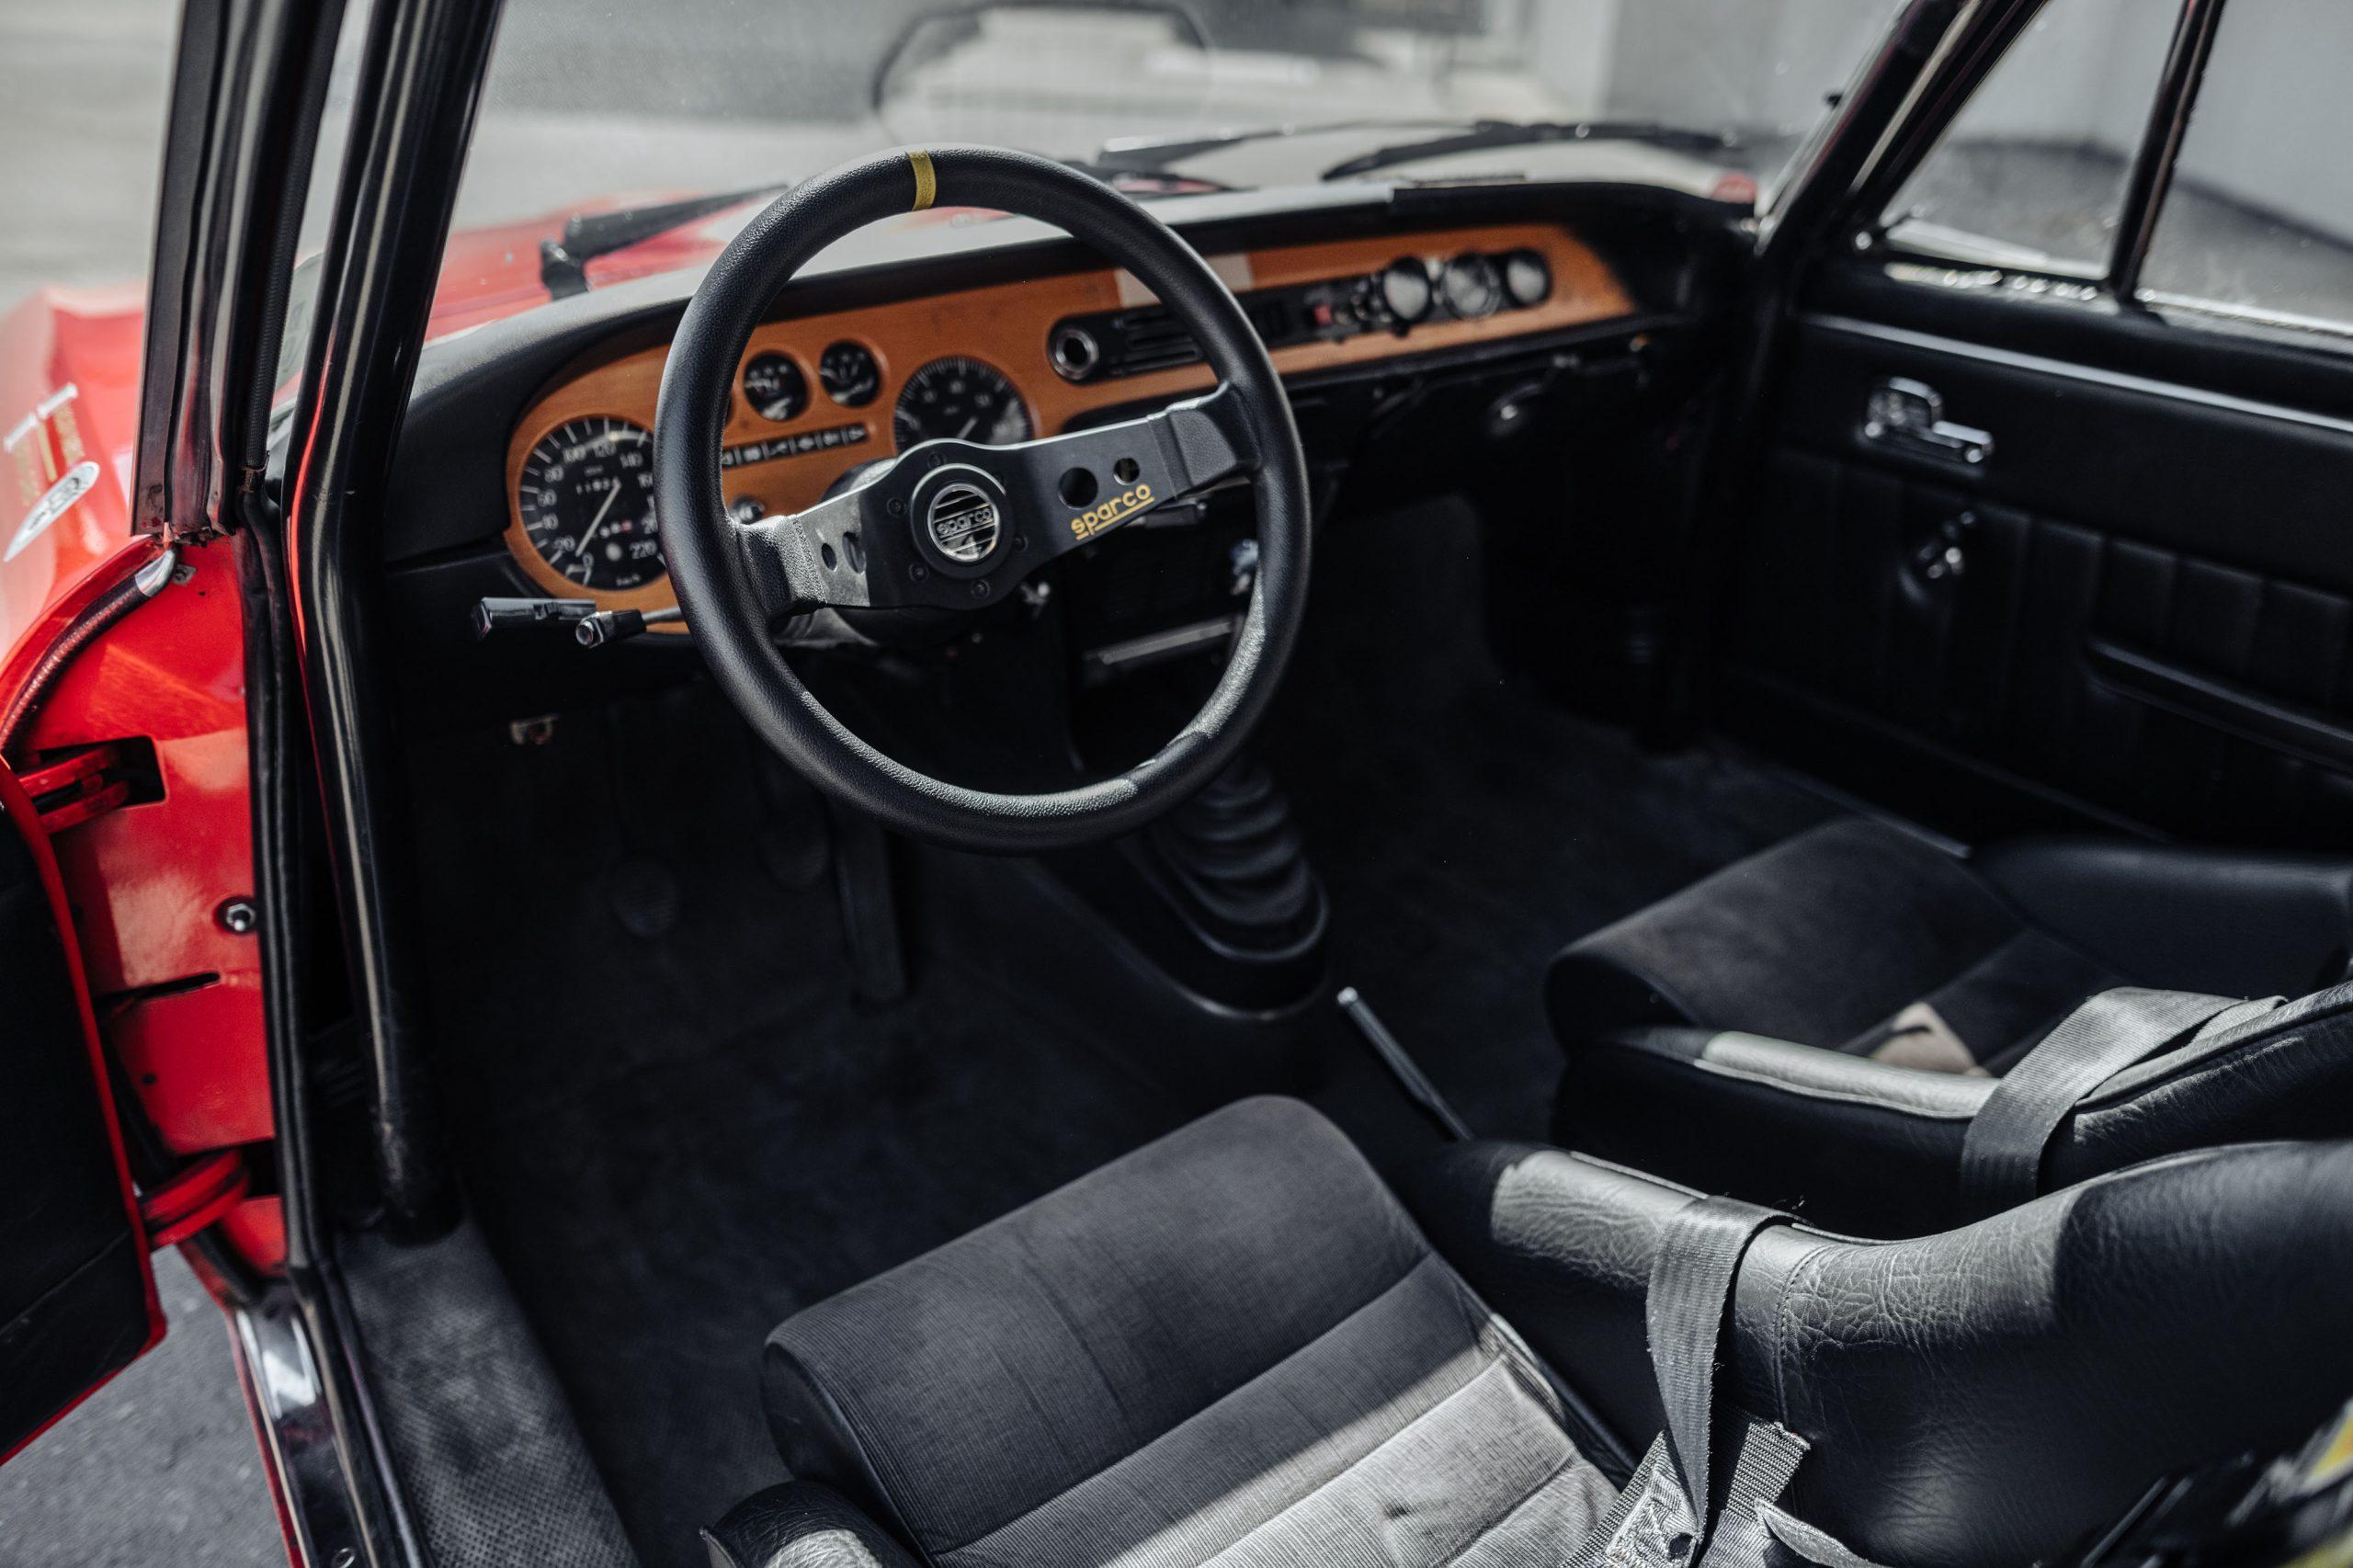 1972 Lancia Fulvia Coupe 1600 HF Series 2 Fanalino interior steering wheel